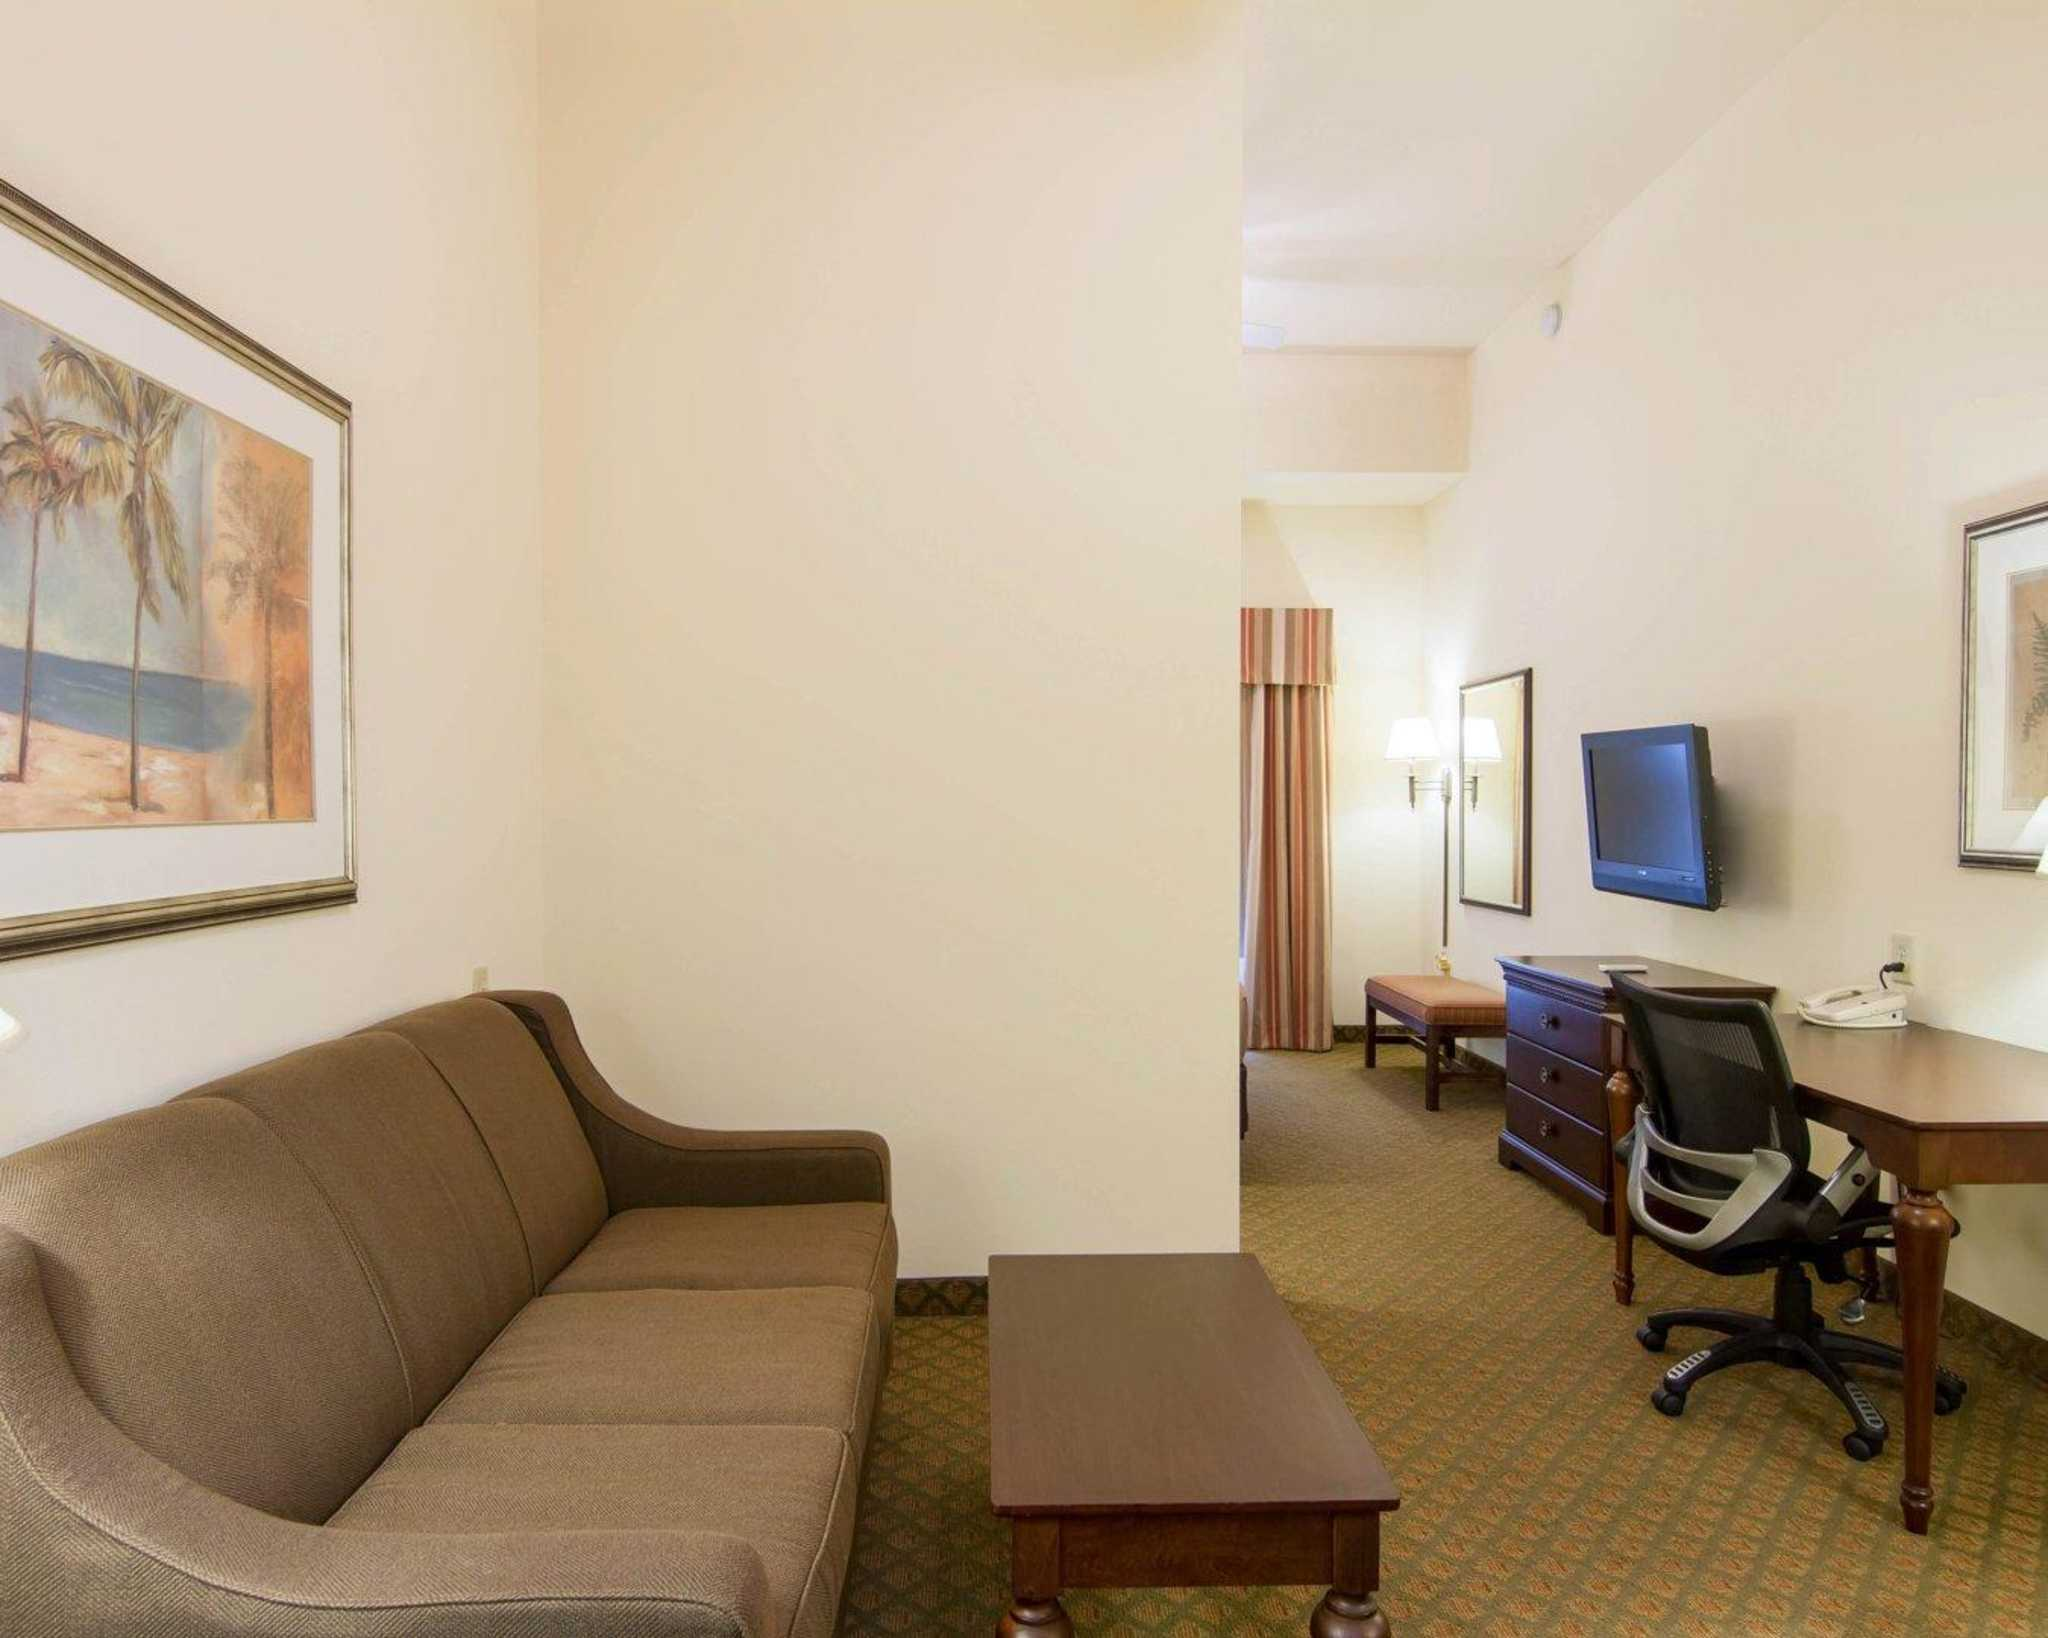 Comfort Inn & Suites Airport image 26